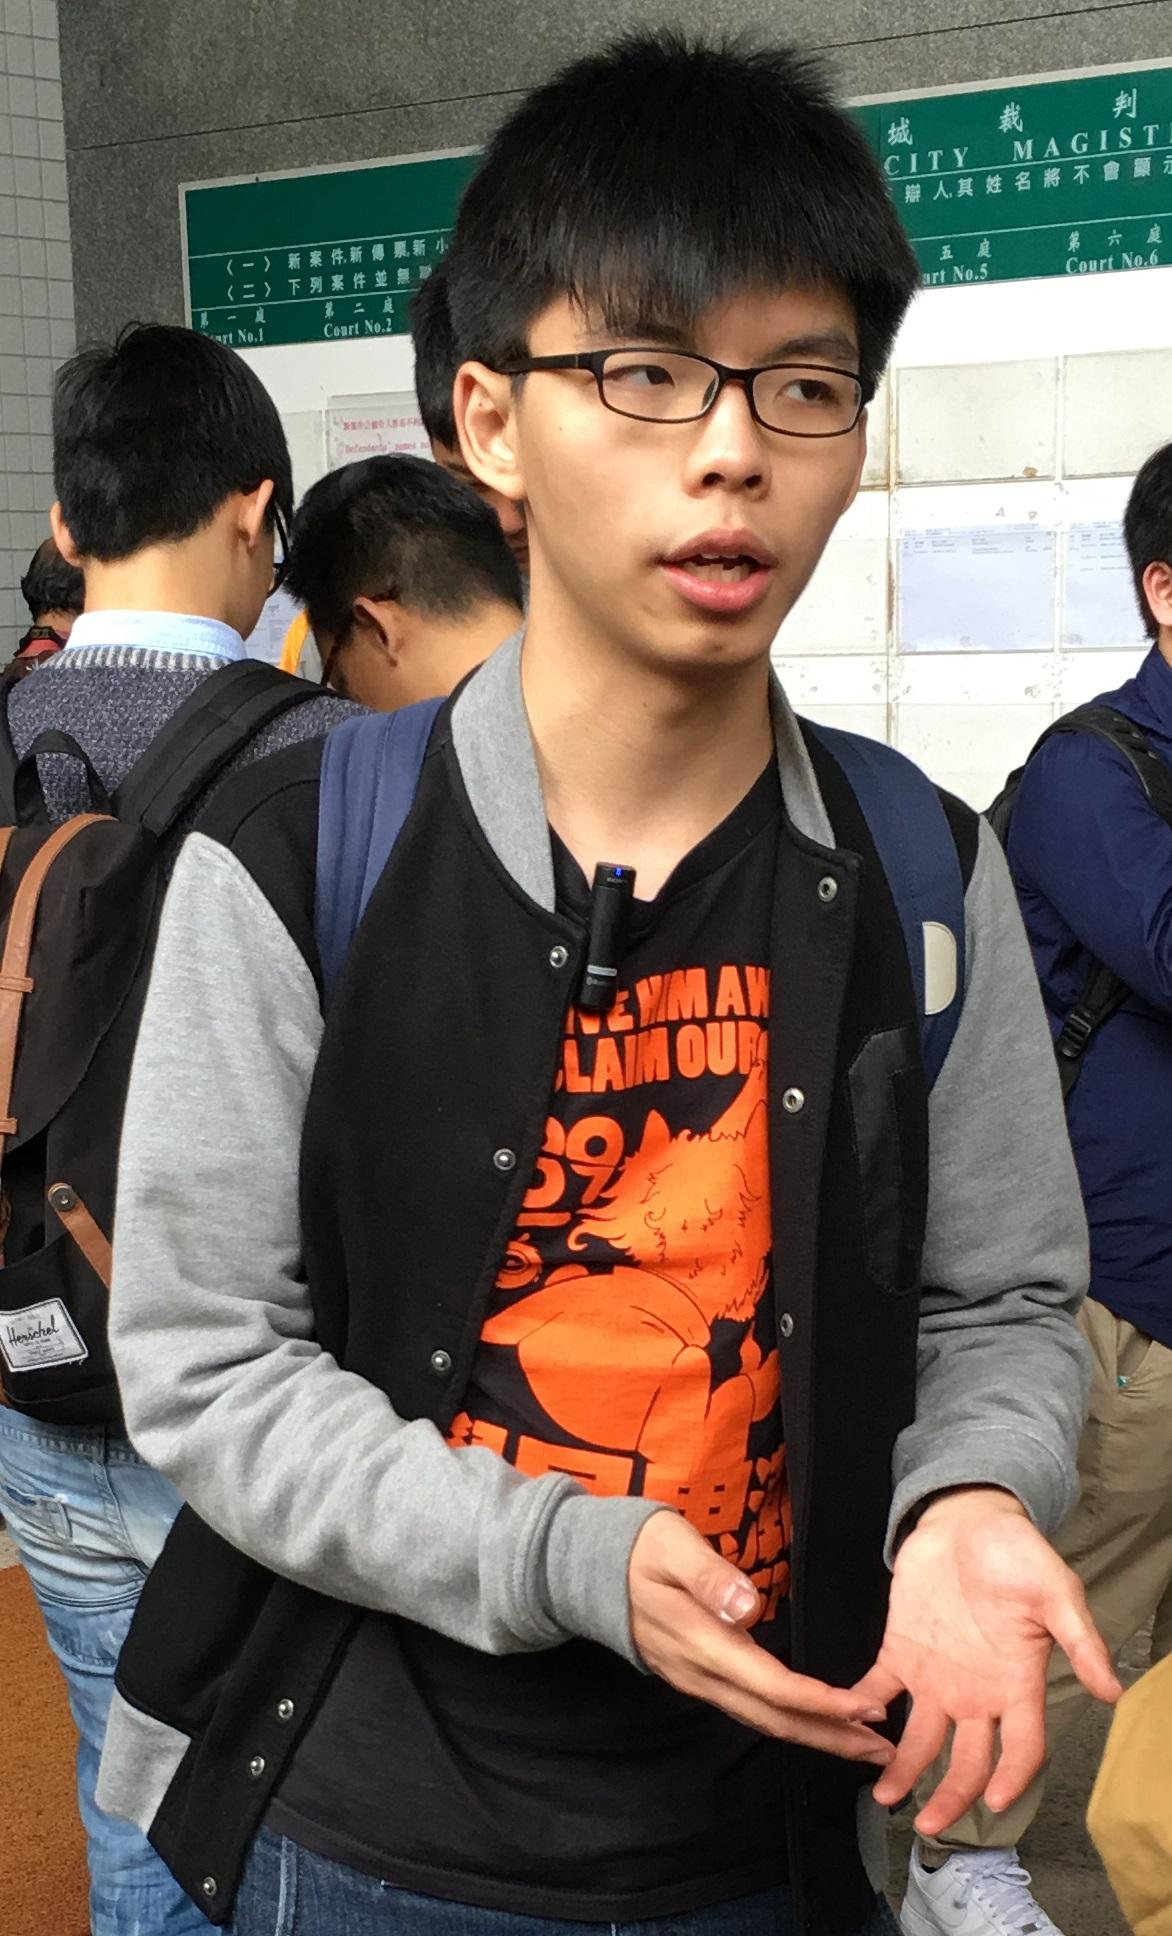 joshua_wong_at_kowloon_city_magistrates_court_at_11-45_on_february_12_2016-1